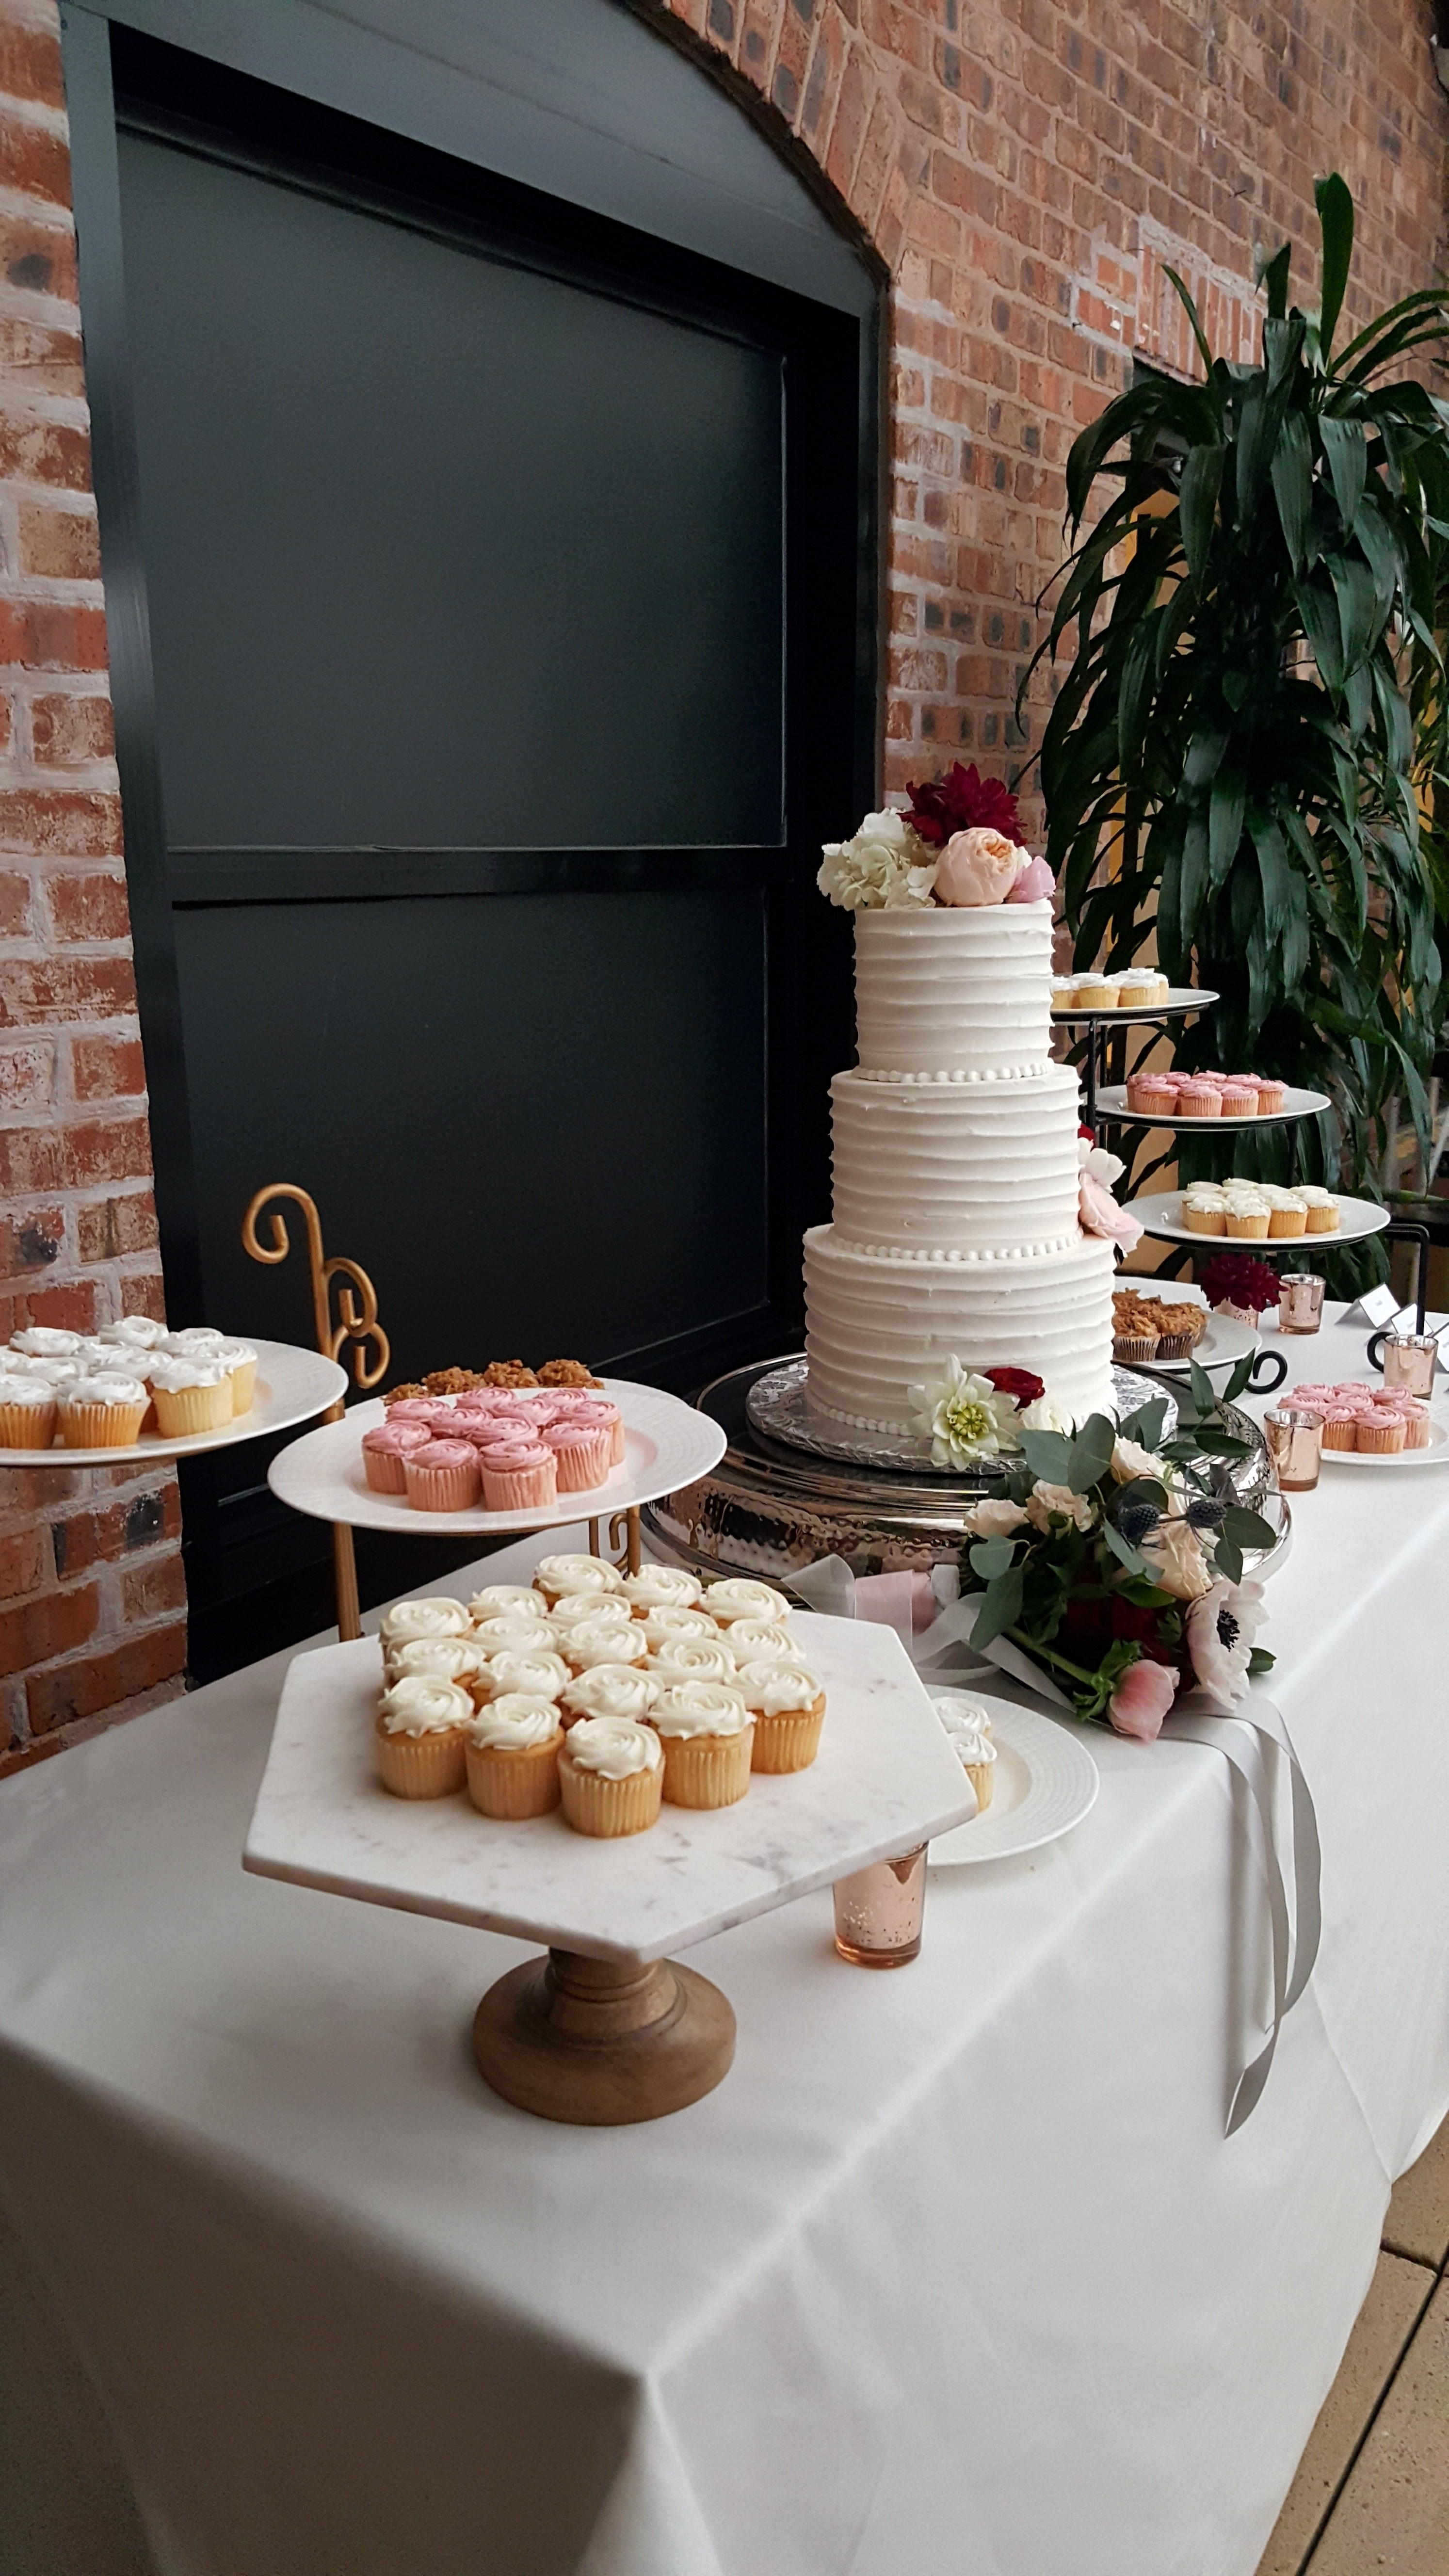 Wedding Cakes by Tammy Allen image 17